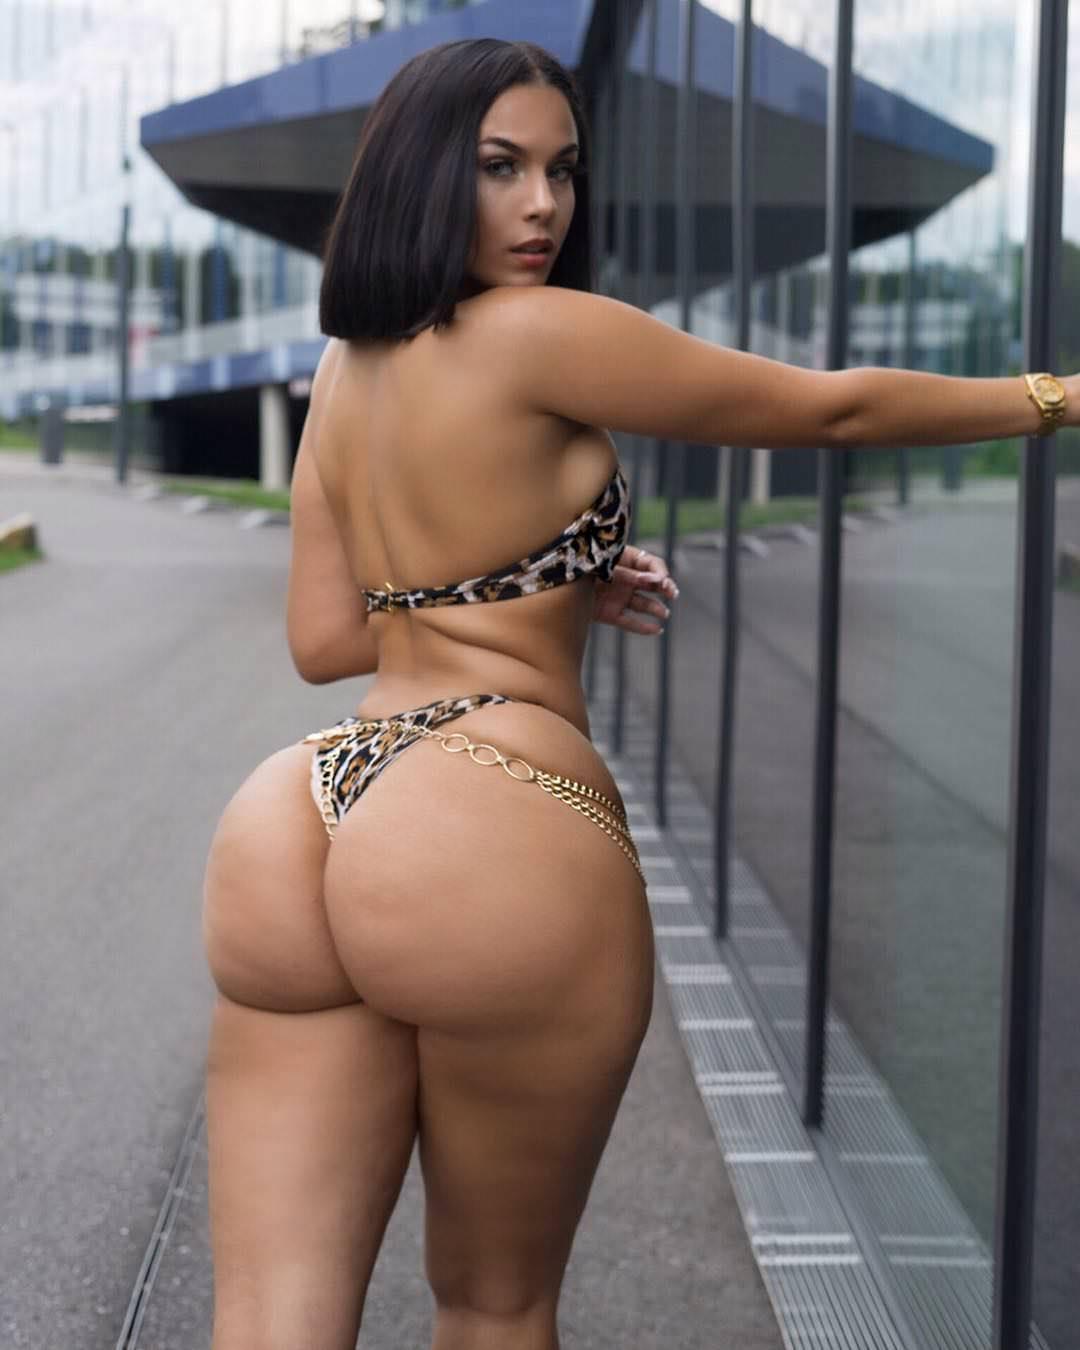 Meet lani blair who tristan thompson cheated on khloe kardashian with